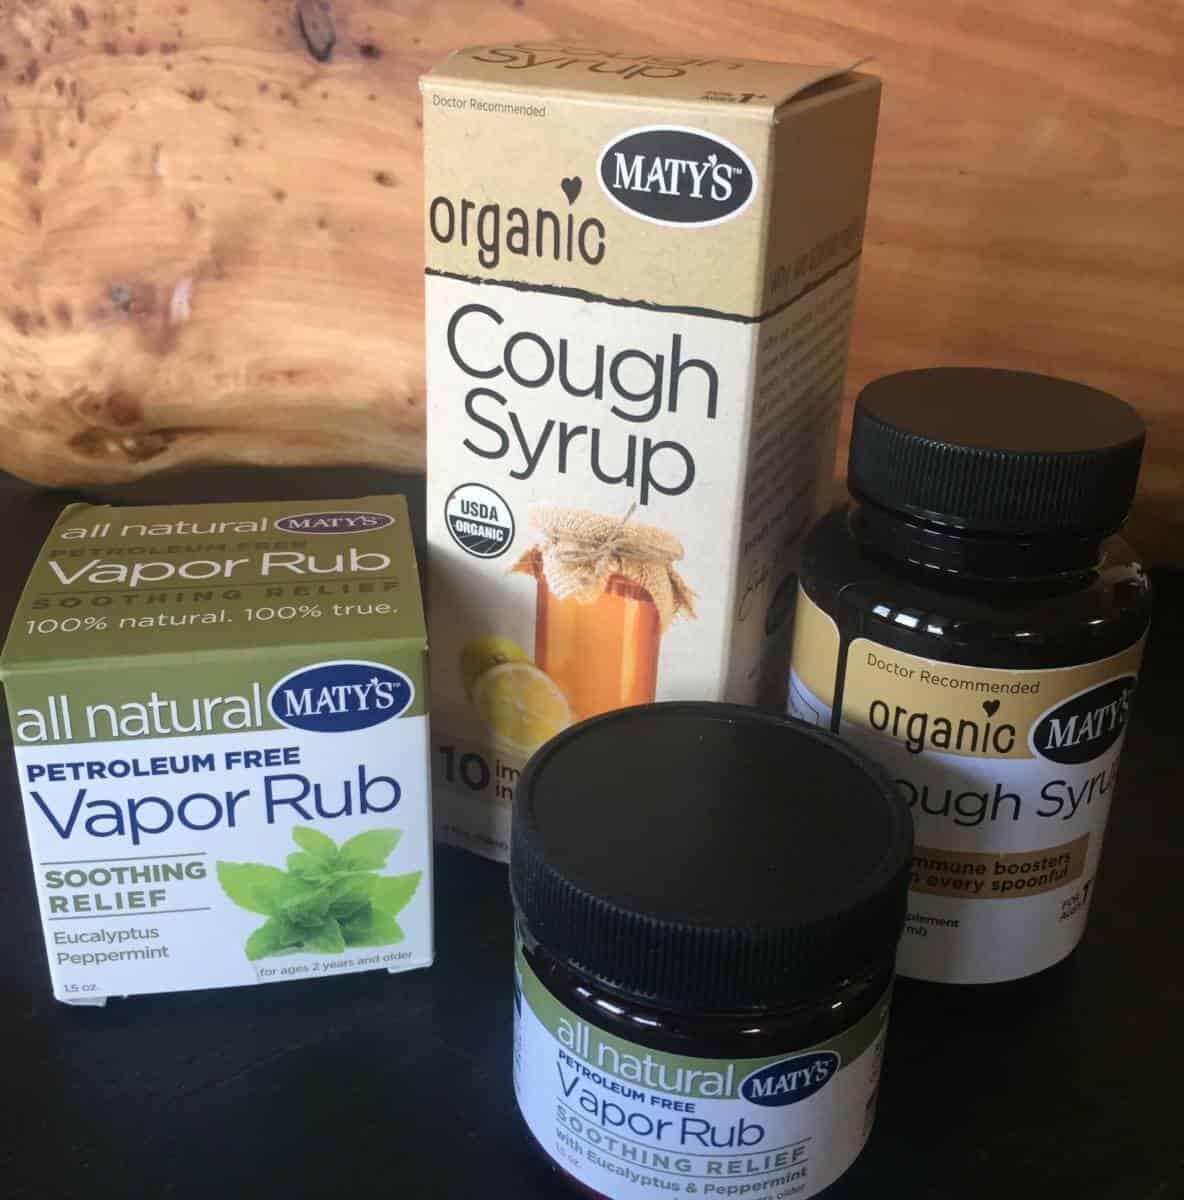 Mary's organic cold medicine